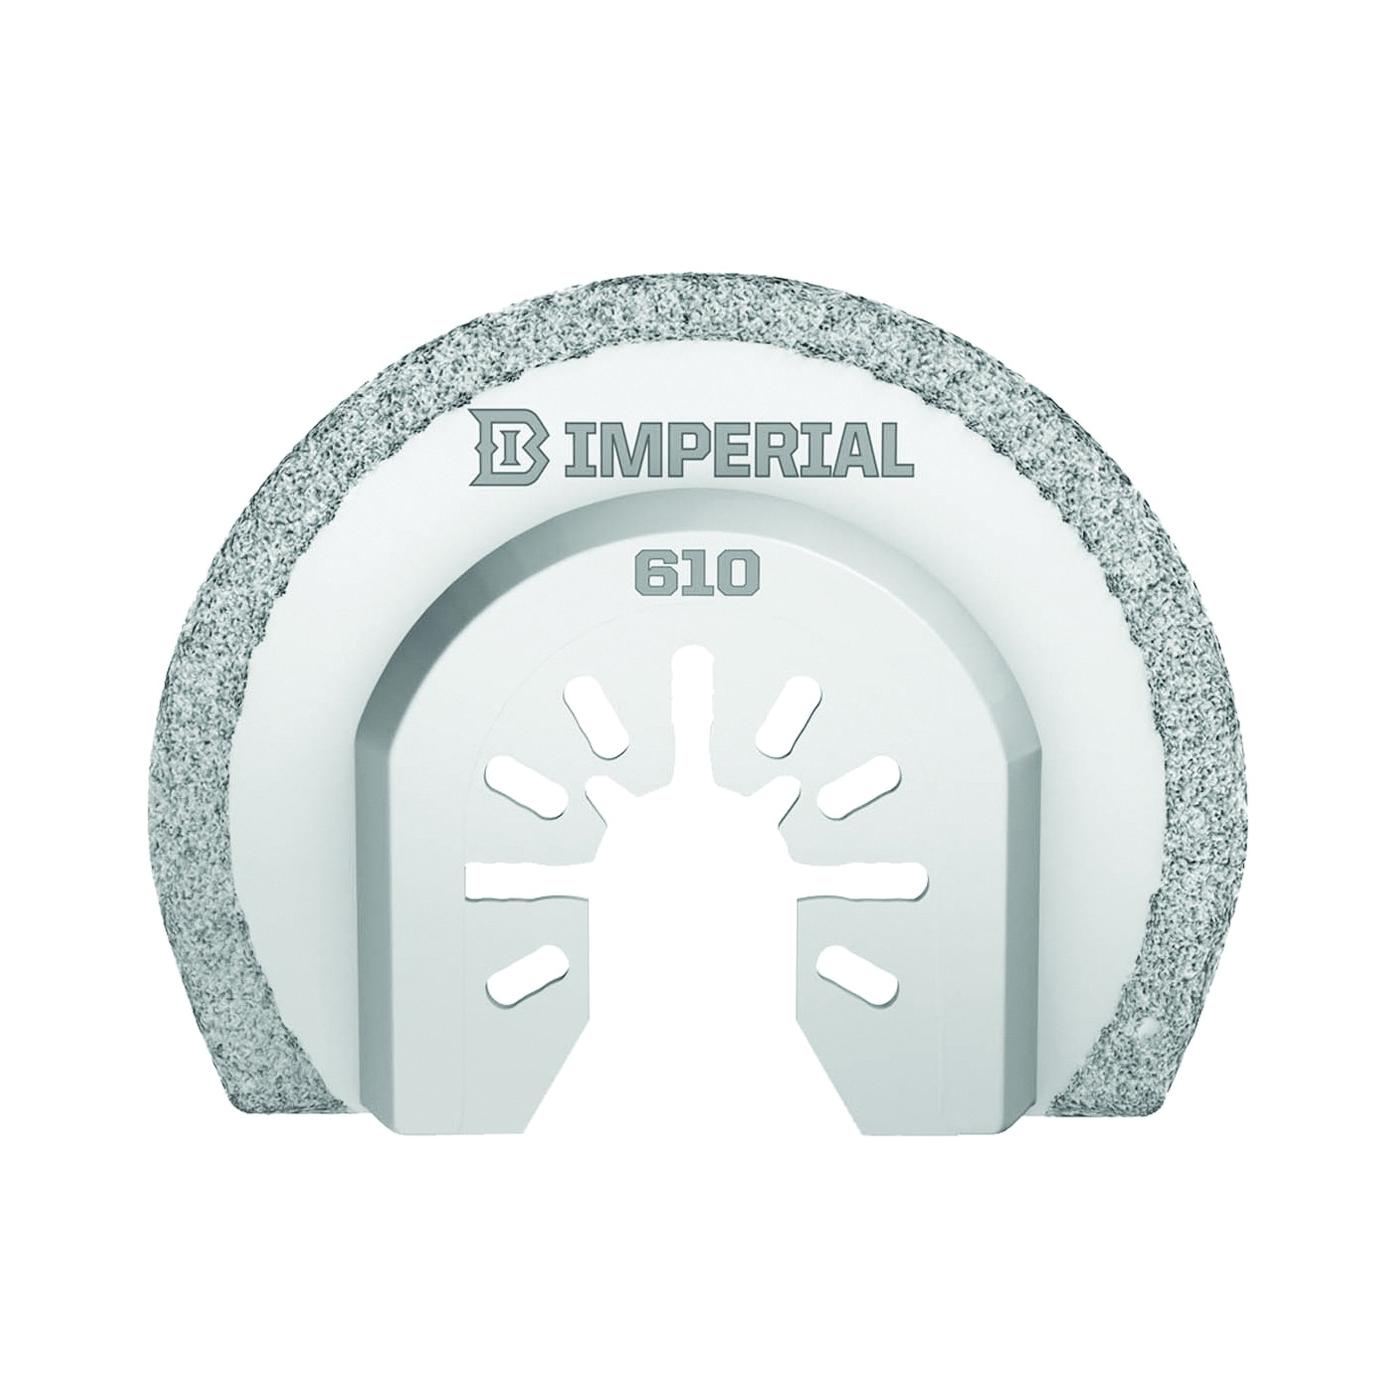 IMPERIAL BLADES IBOA610-1